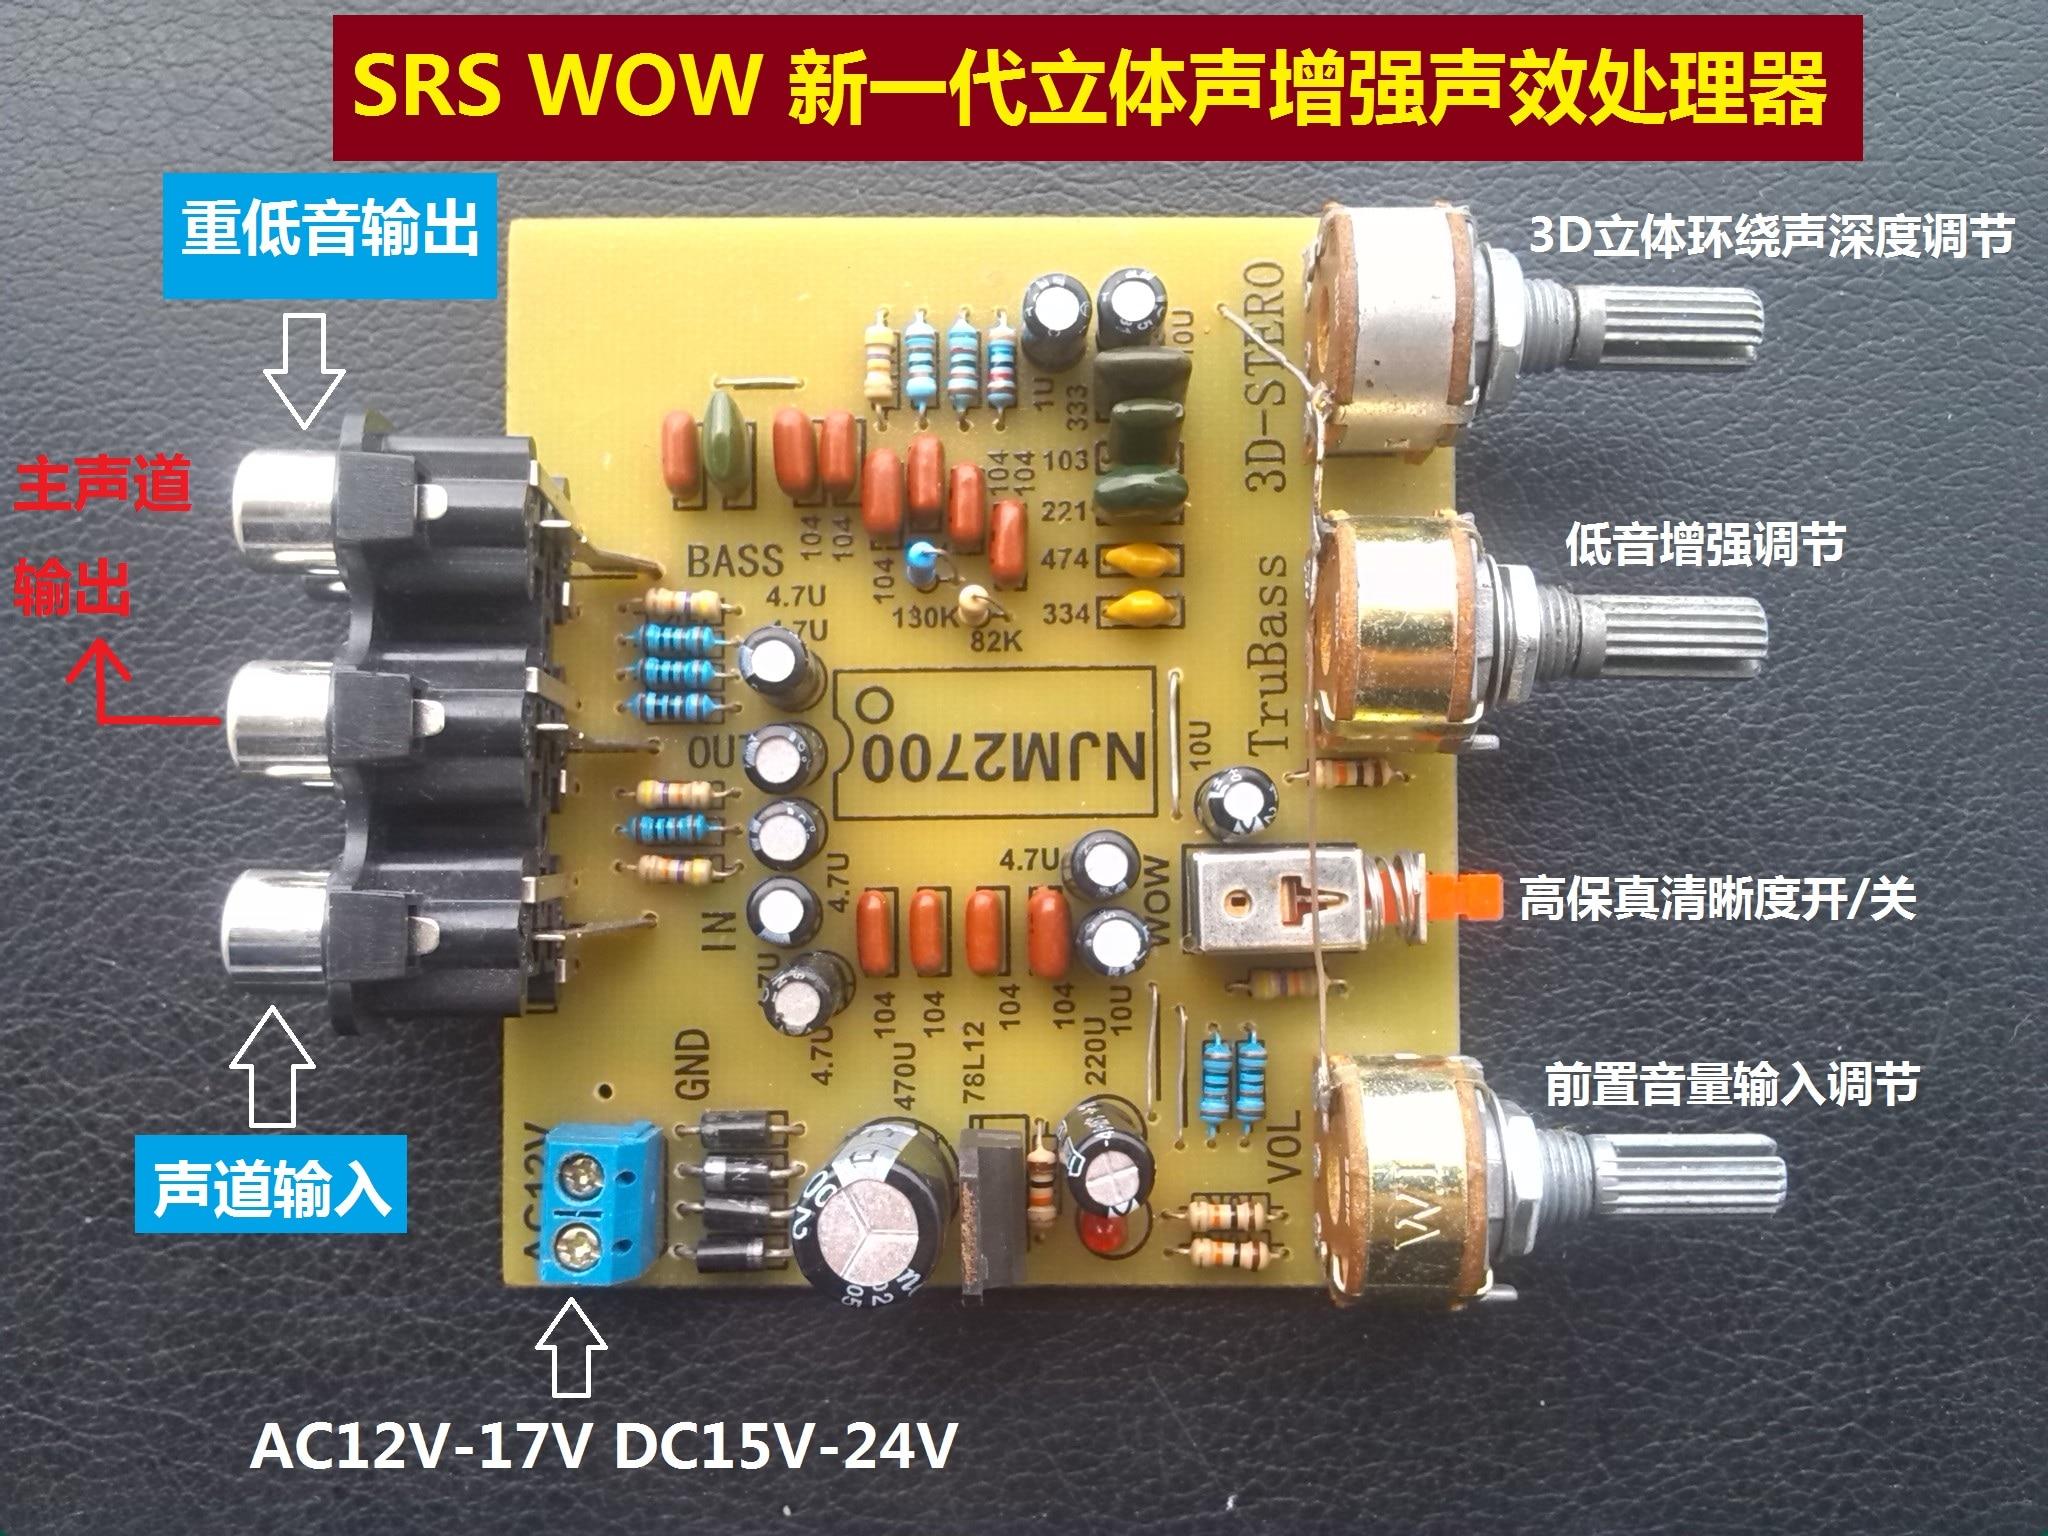 WOW 3DSRS Next Generation Stereo Enhancement System Fever Grade Sound Processor Sound Upgrade Board